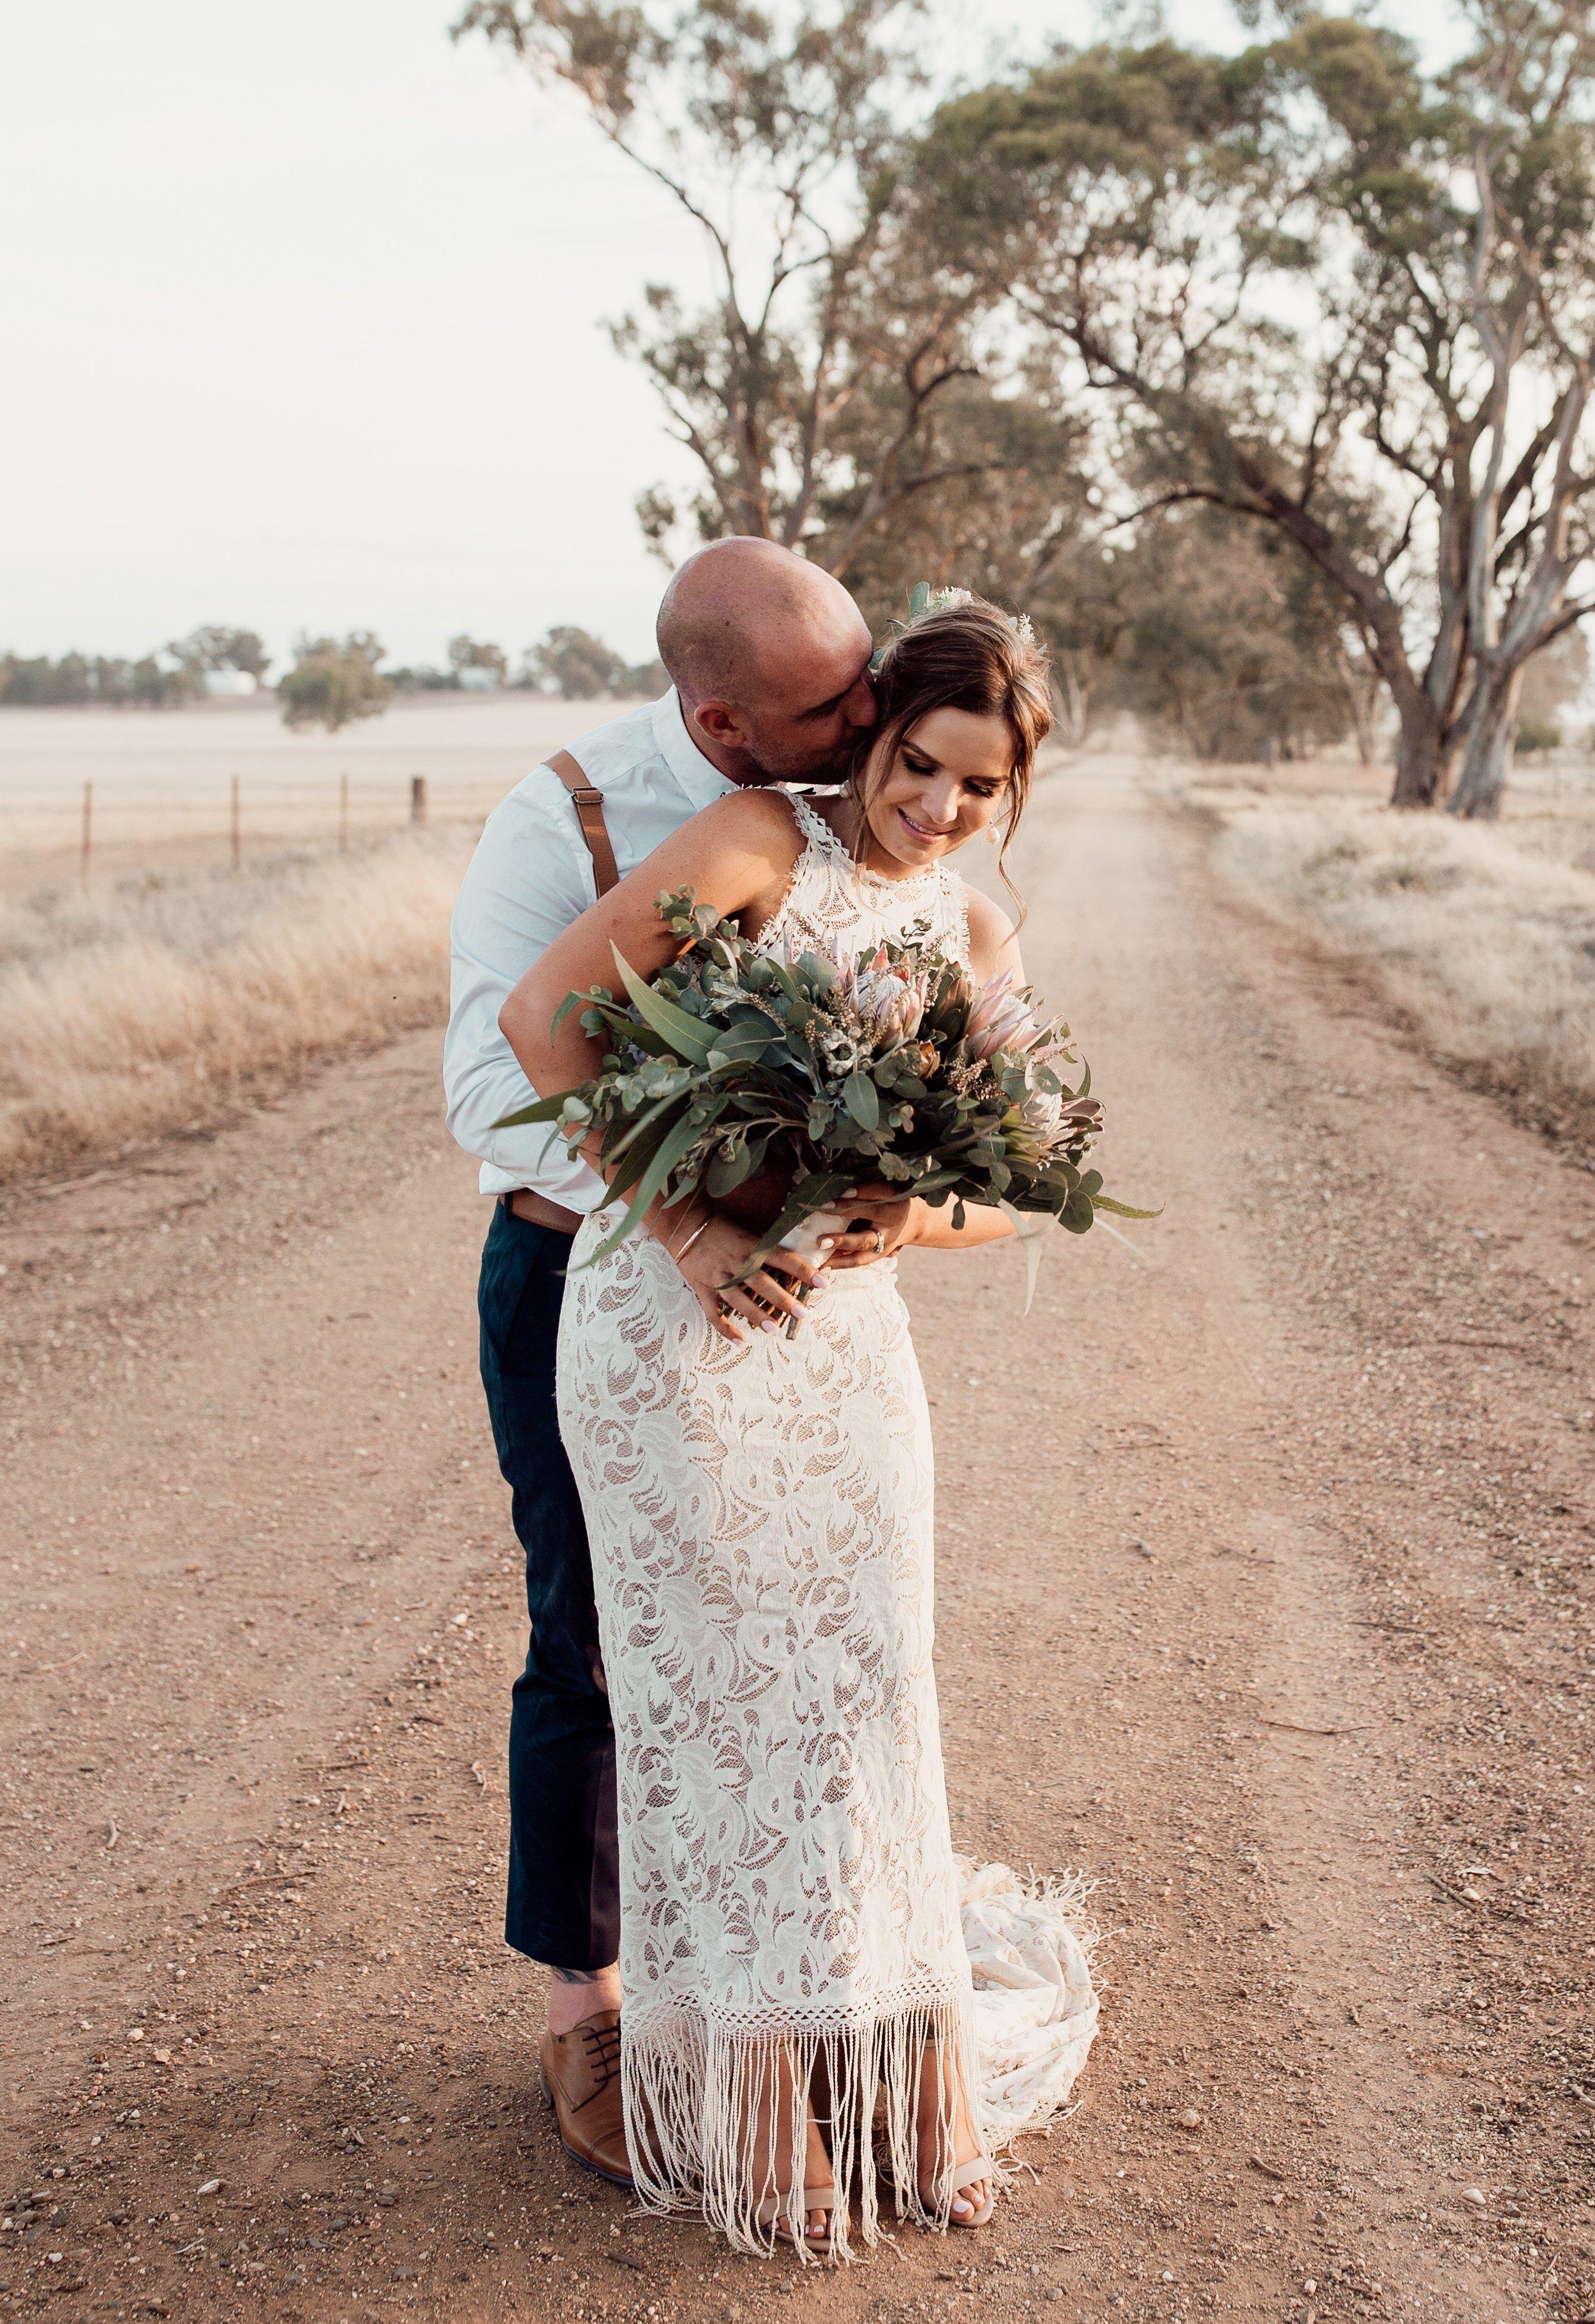 mickalathomas_puremacphotography_weddingphotographer_couplephotographer_Sheppartonphotographer_1471.jpg